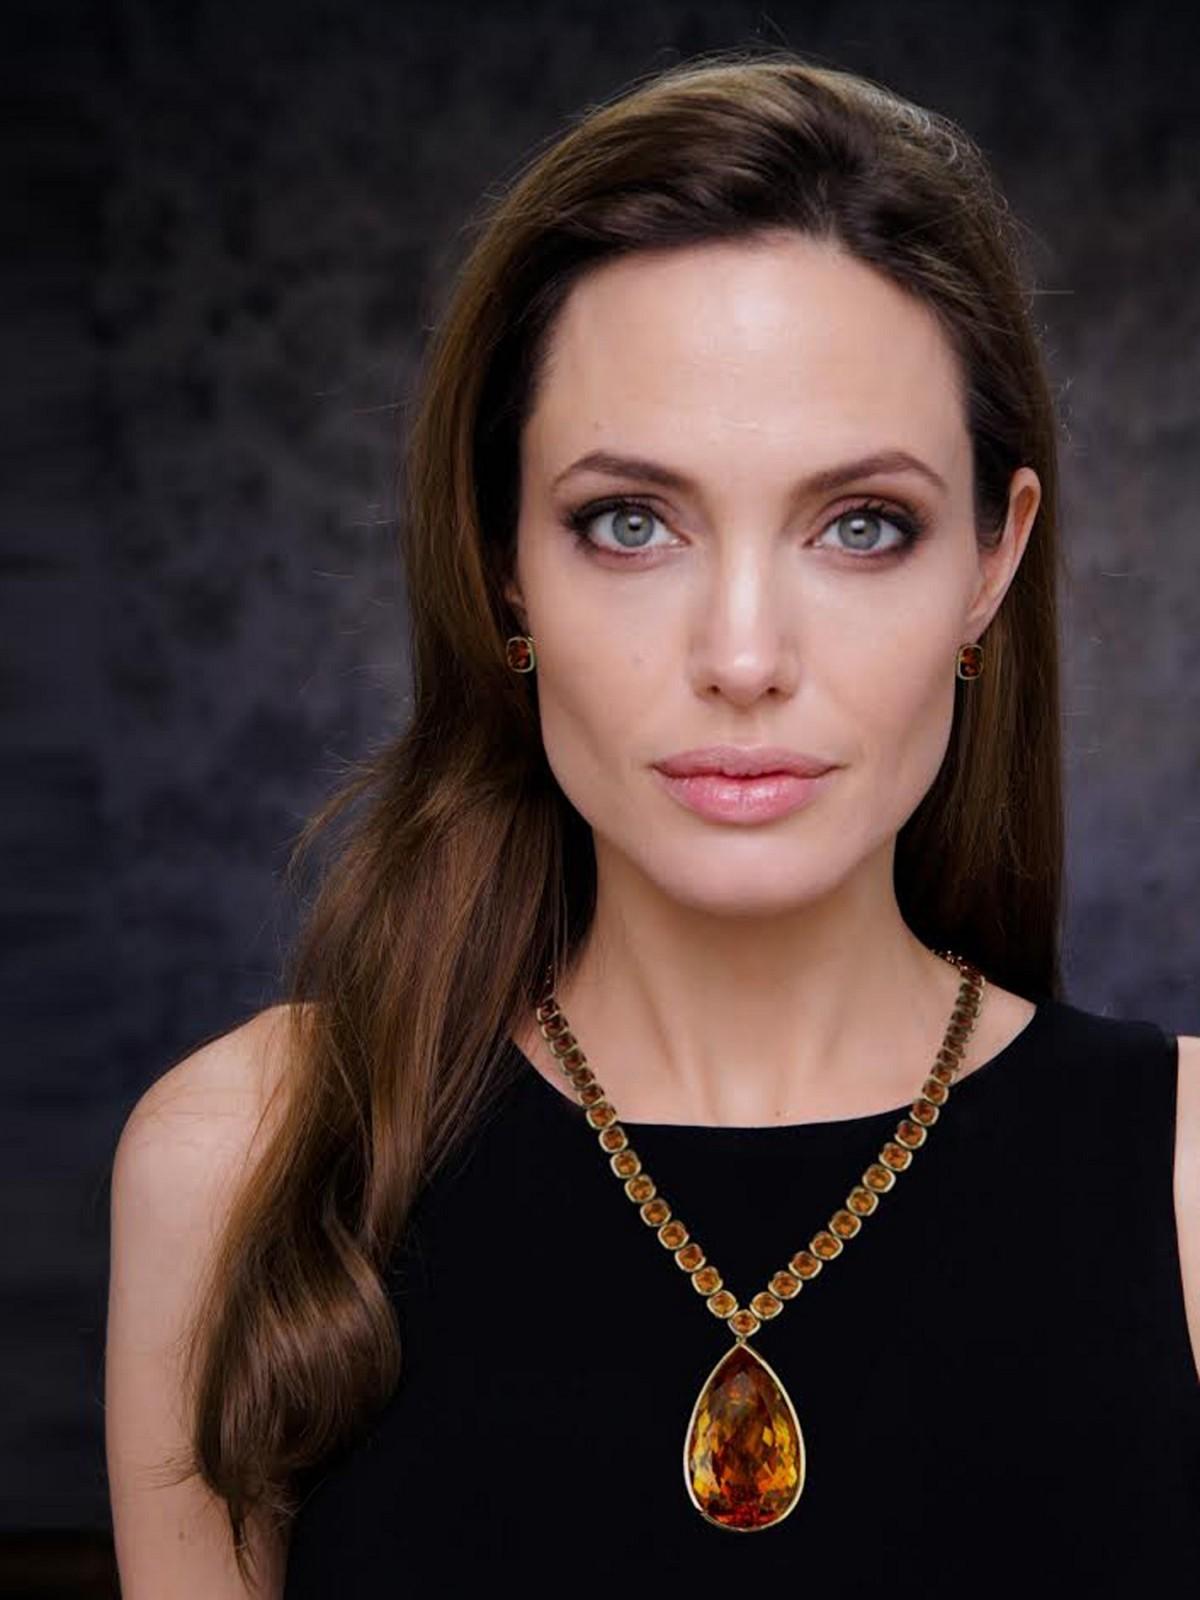 Angelina Jolie Background Wallpapers